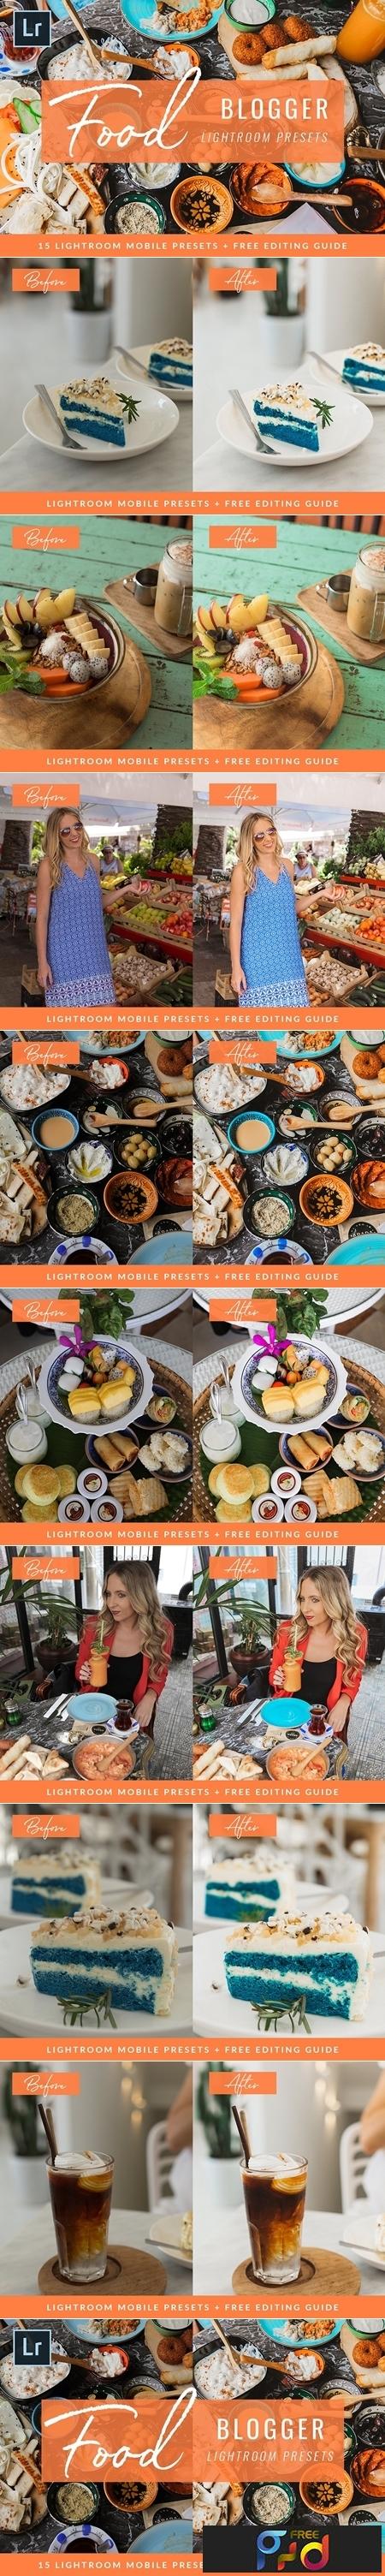 Food Photography Lightroom Presets 3121769 1